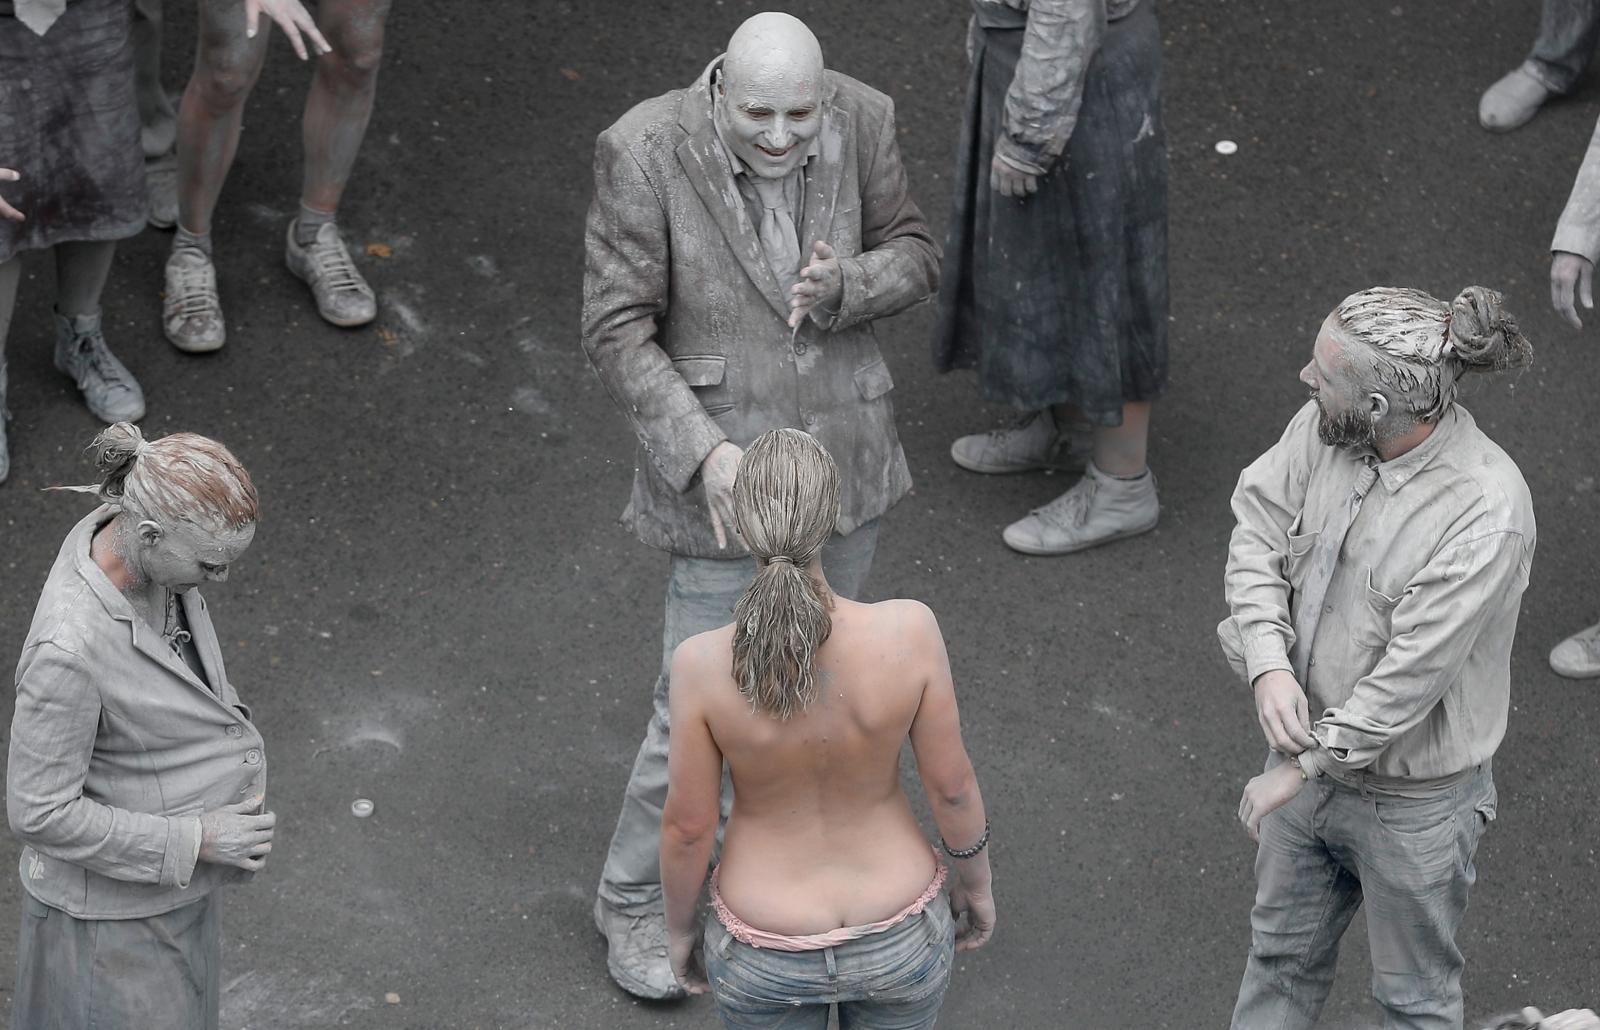 nude protest zombie